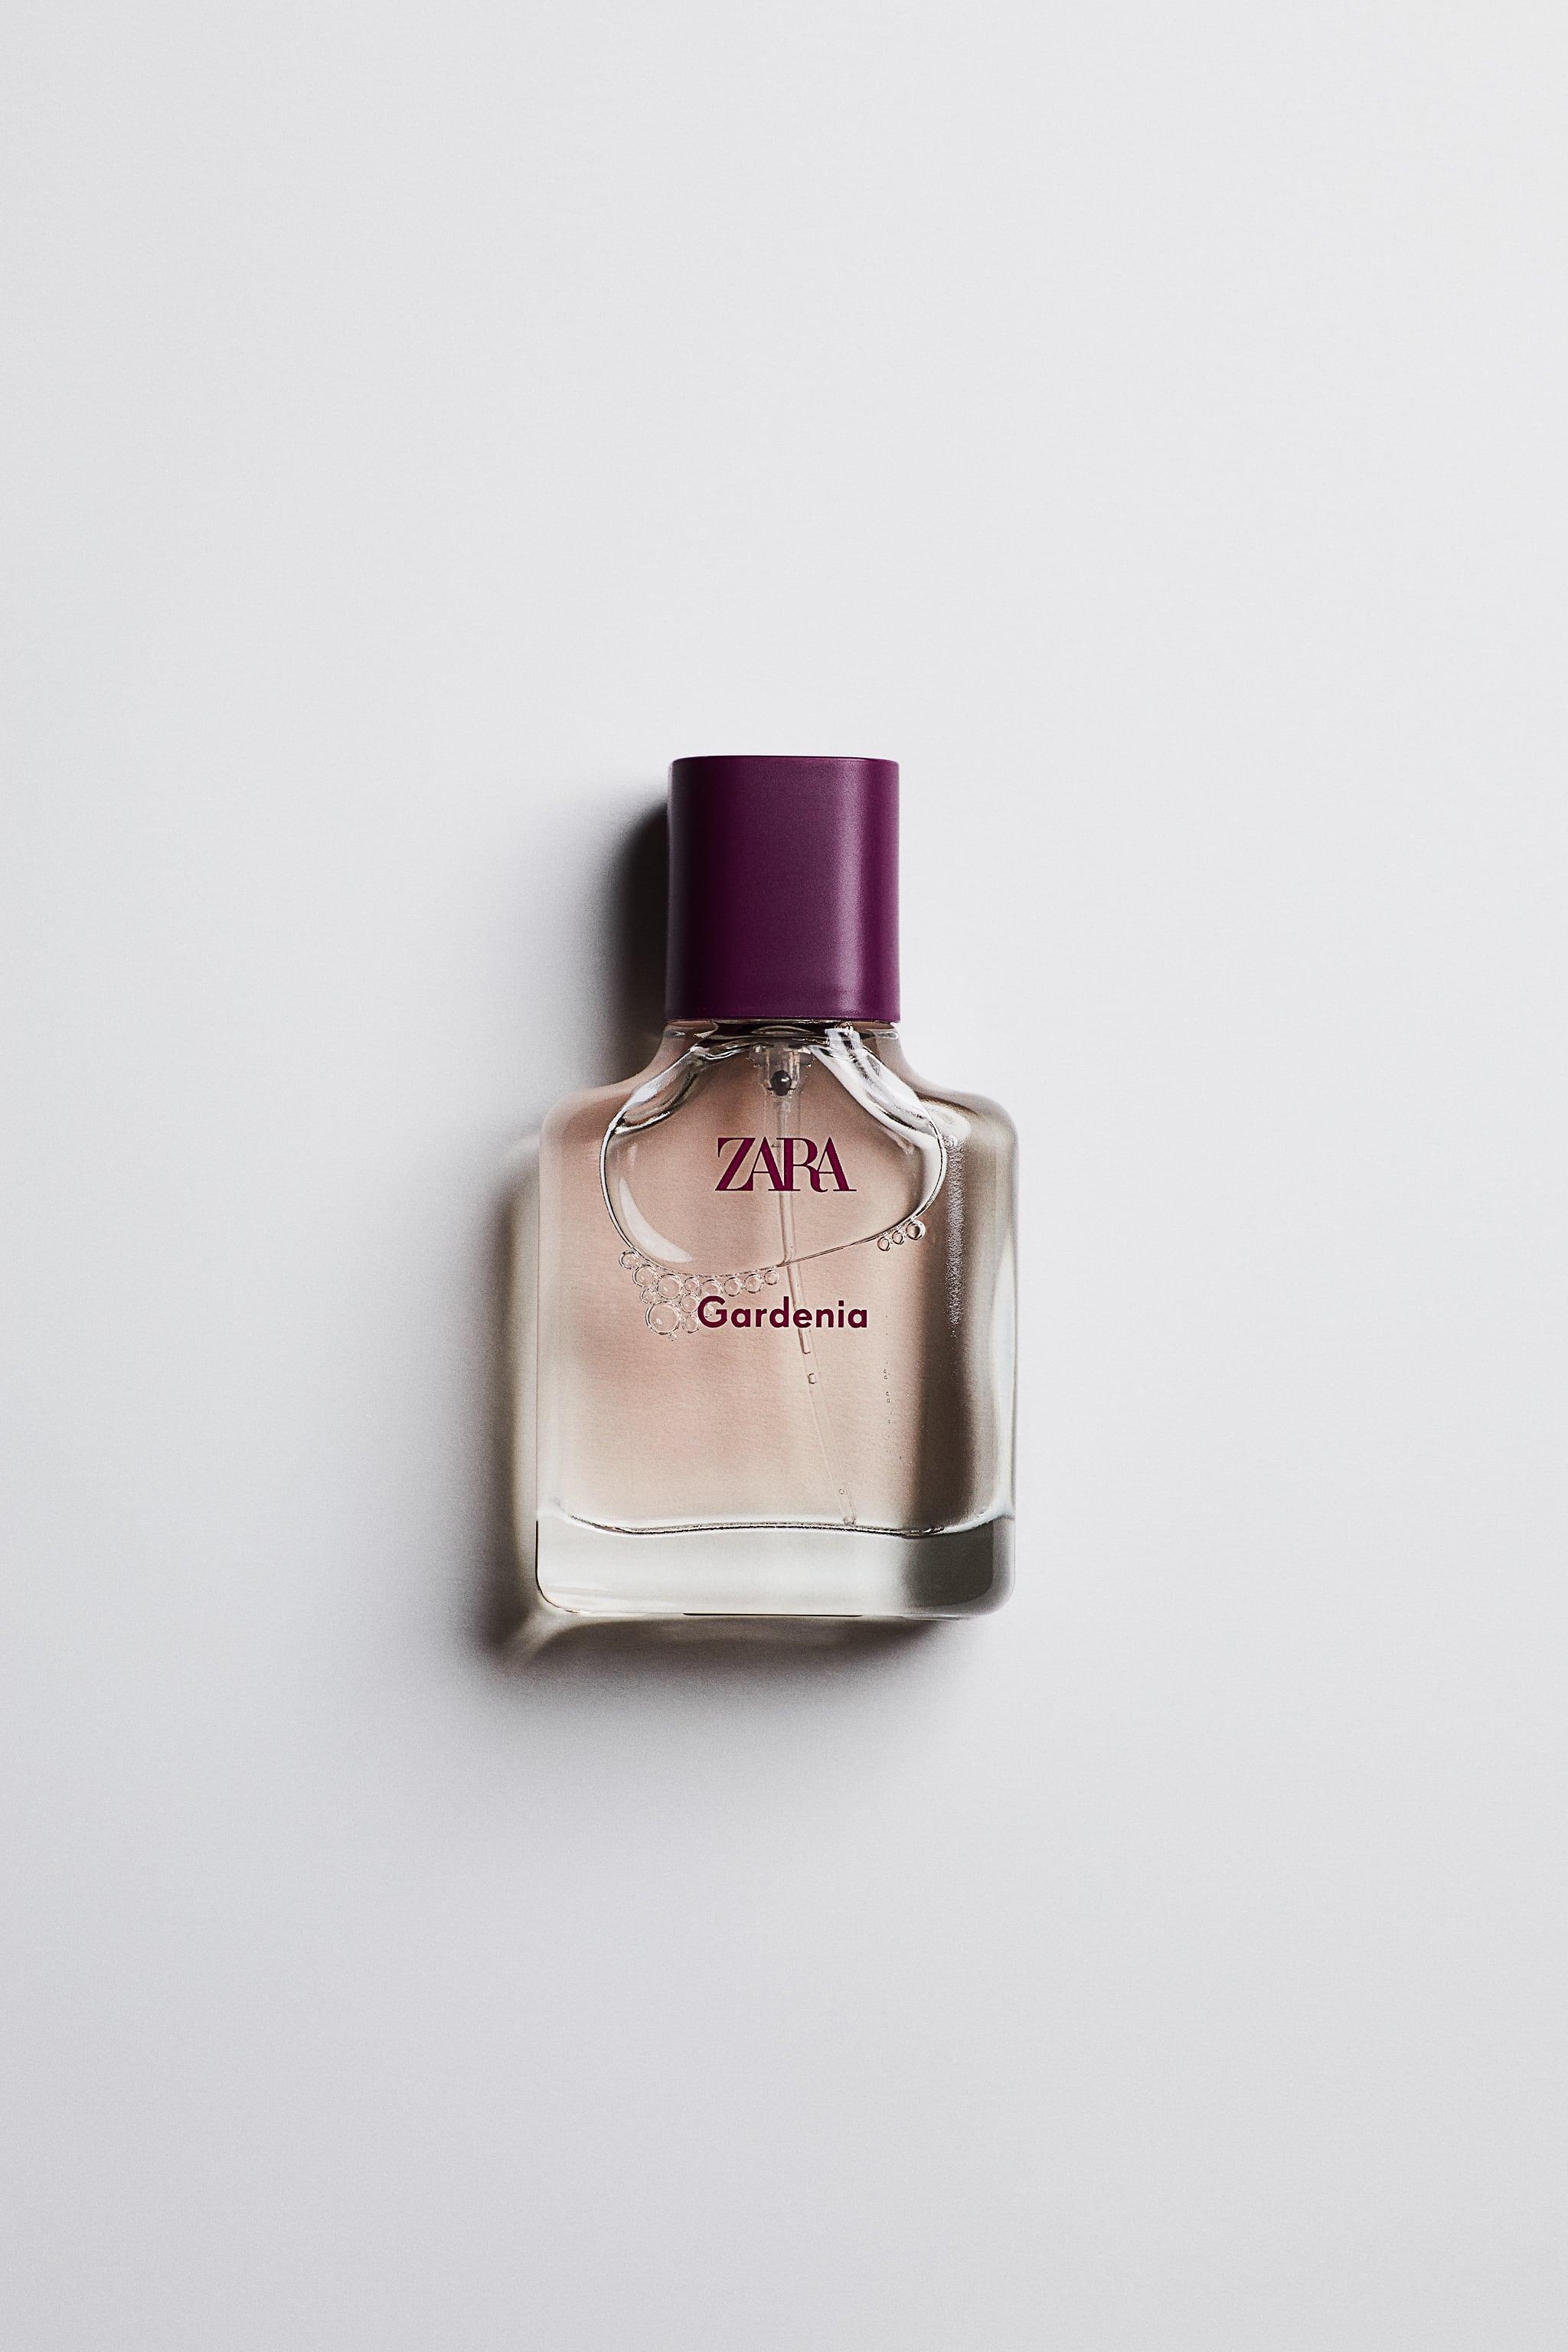 ZARA GARDENIA 30 ML